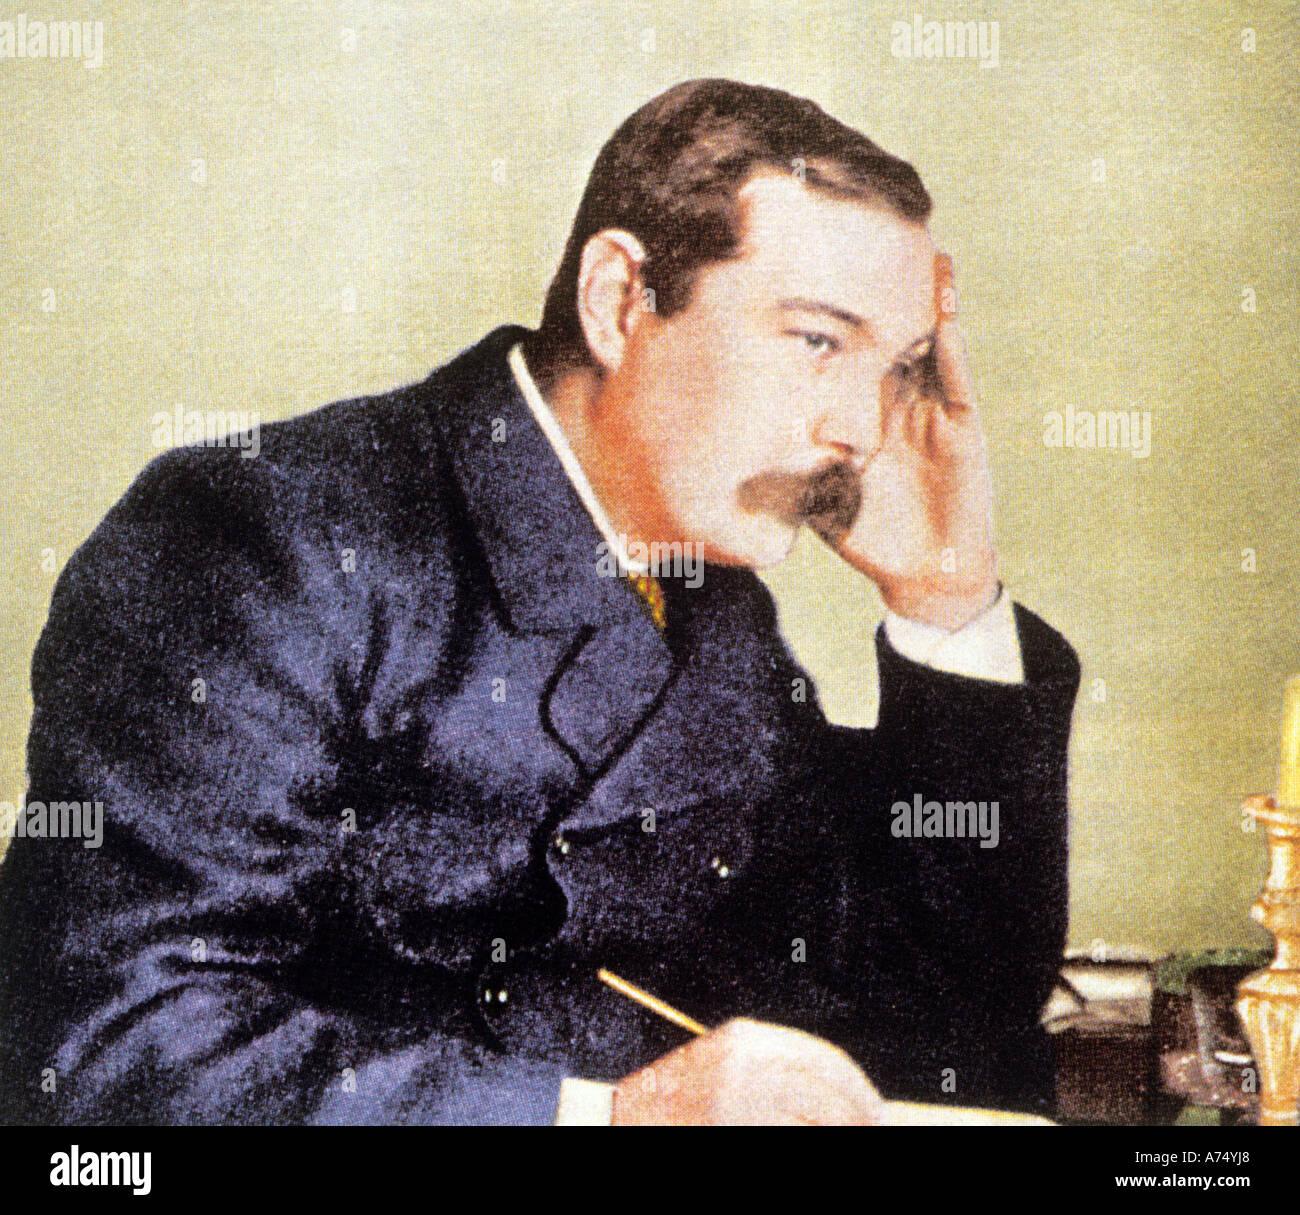 ARTHUR CONAN DOYLE Scottish writer 1859 to 1930 who created Sherlock Holmes - Stock Image